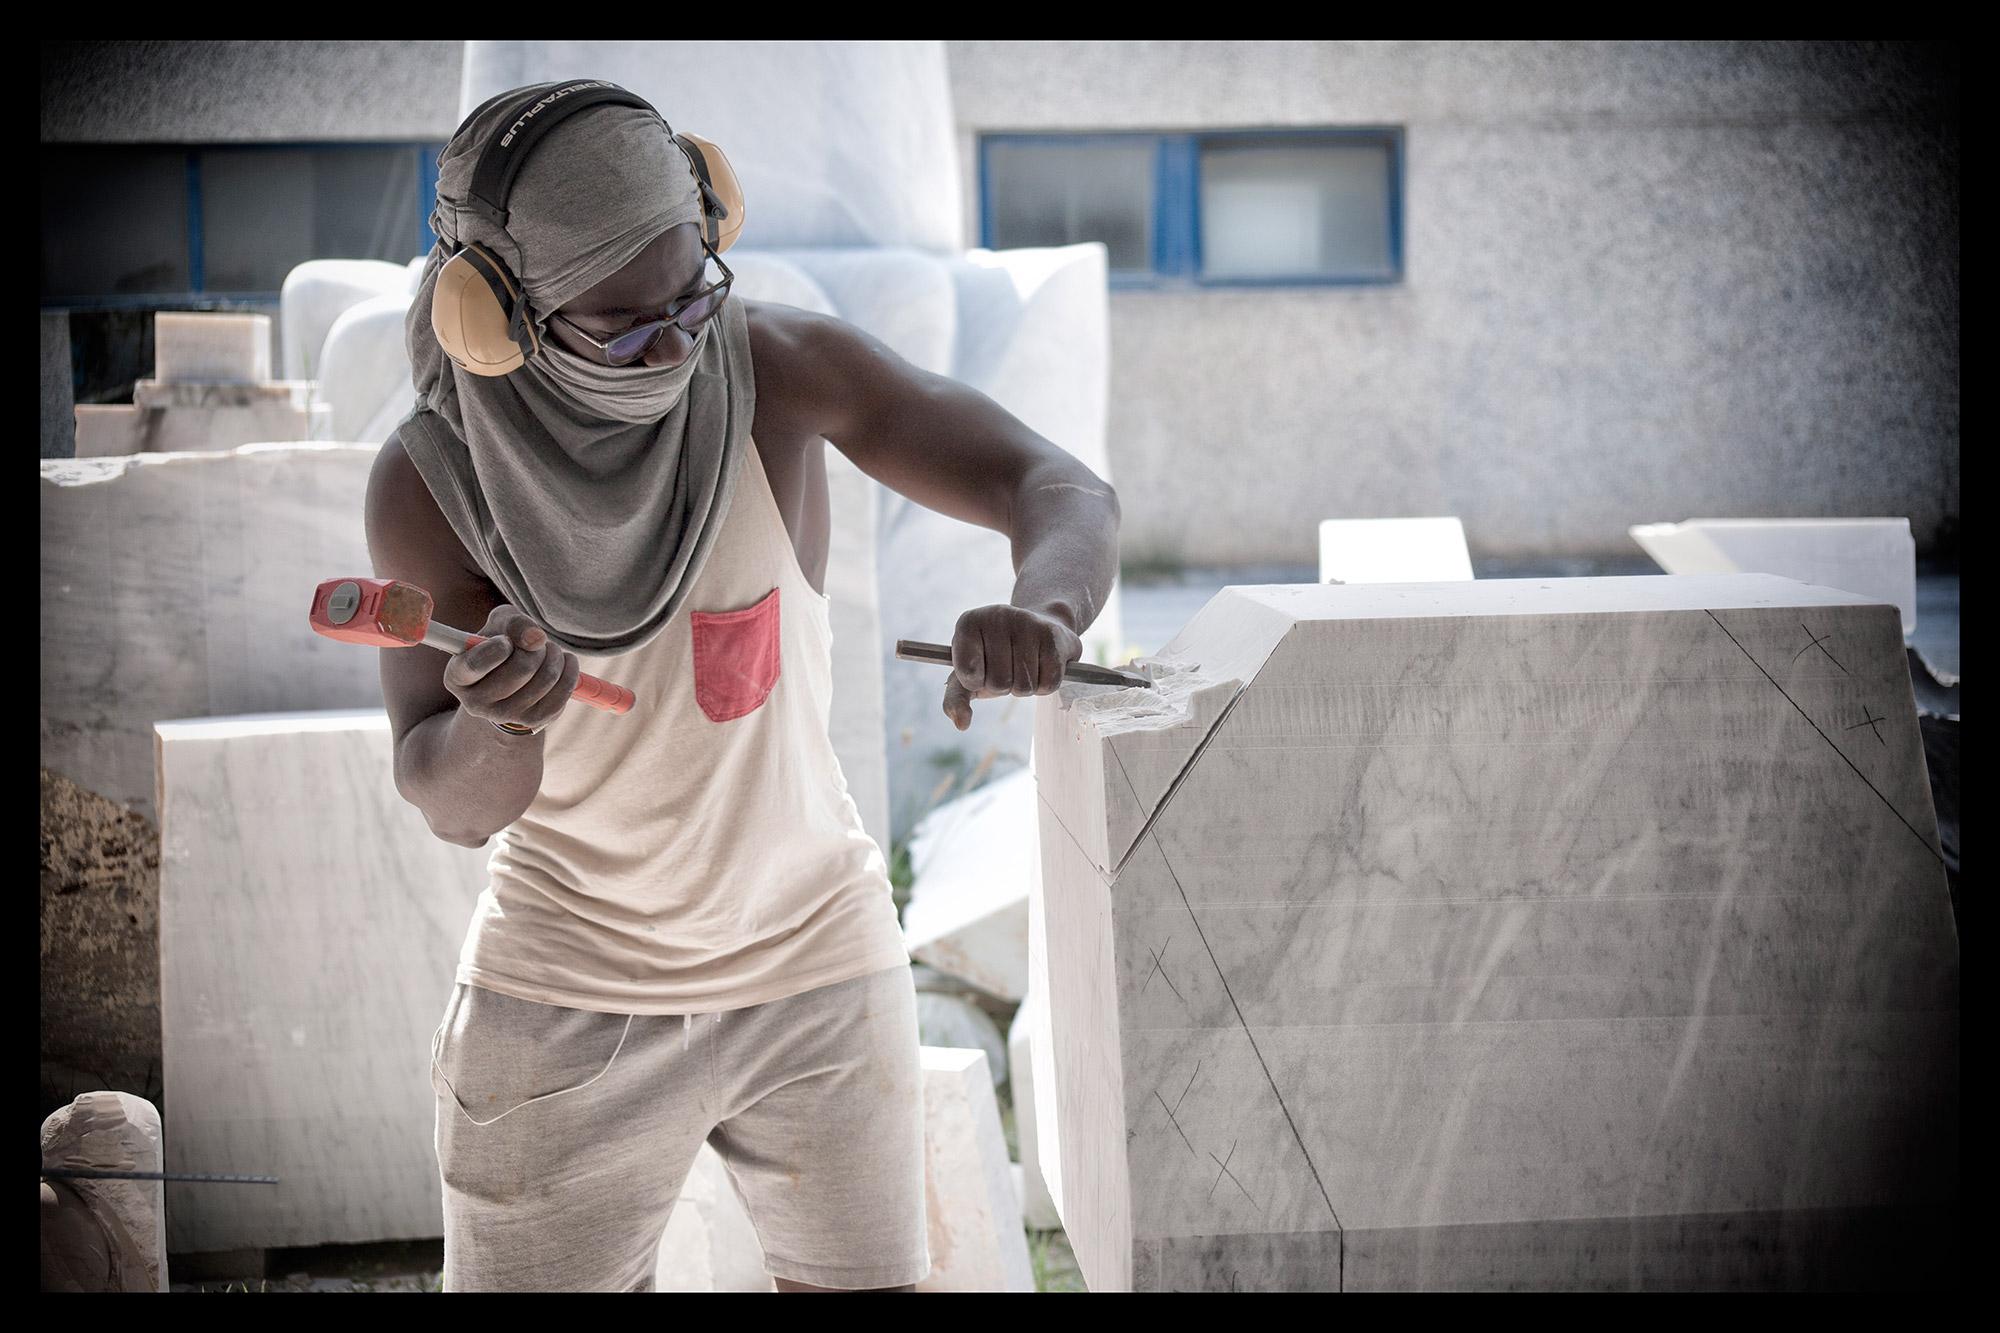 New-York-Academy-of-Art-Carrara-Residency-Brice-Esso-Jiannan-Wu20171213_0175.jpg